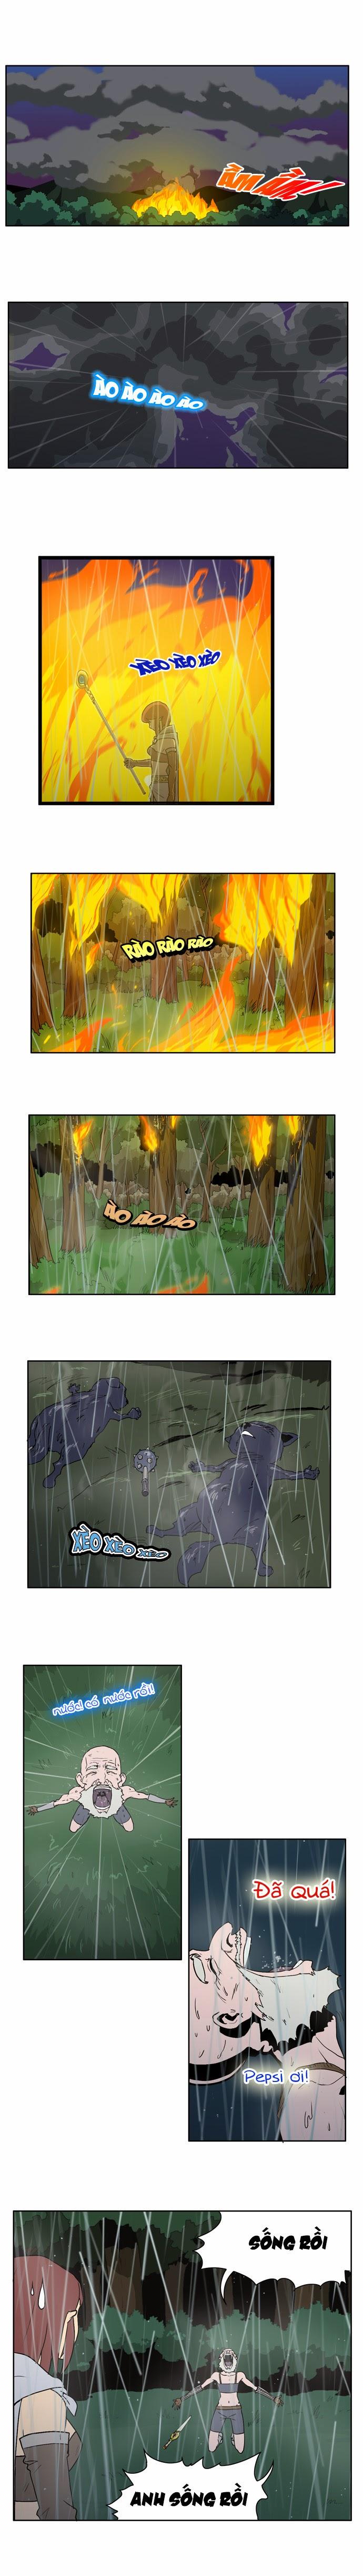 Dragon Son Changsik Chapter 5-6 - Hamtruyen.vn